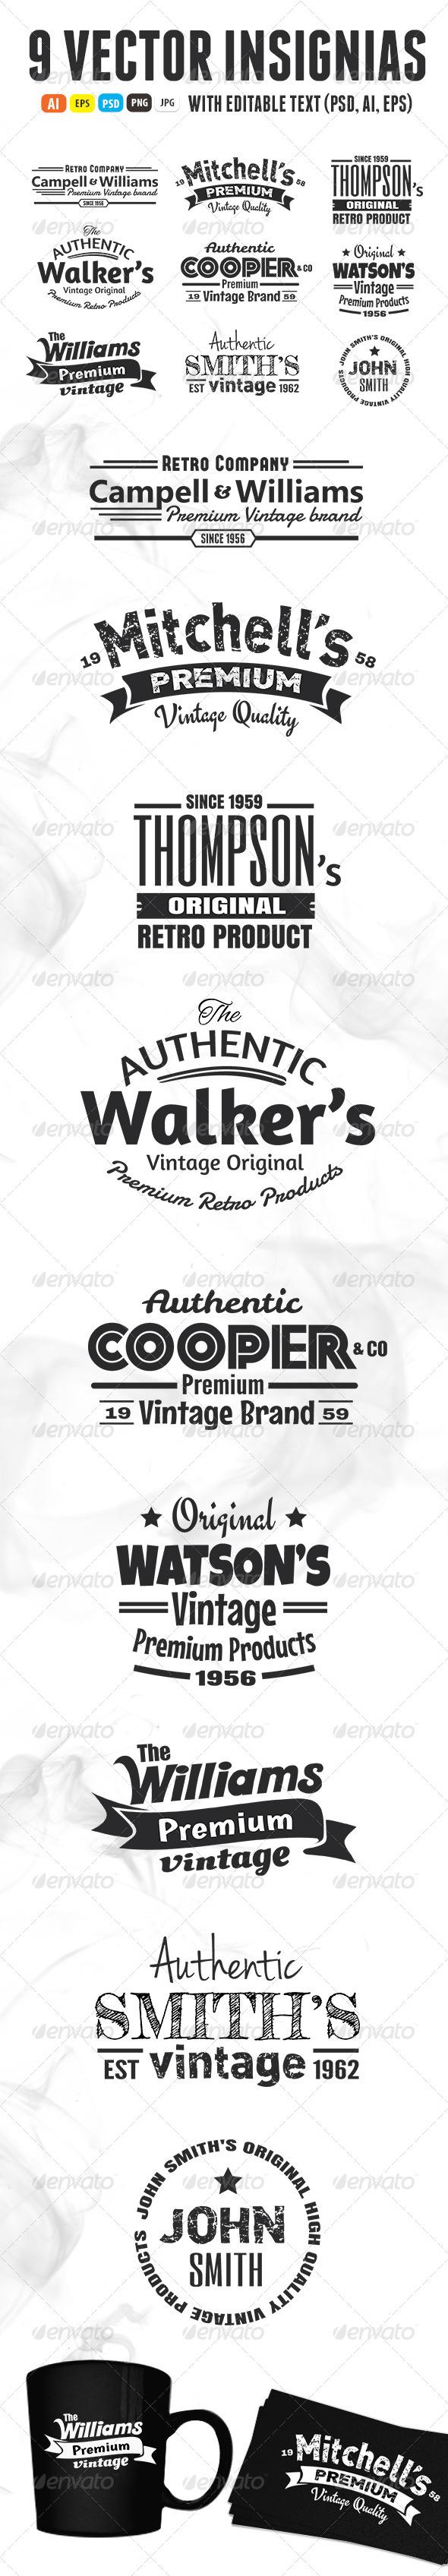 GraphicRiver 9 Vintage Insignias 5739119